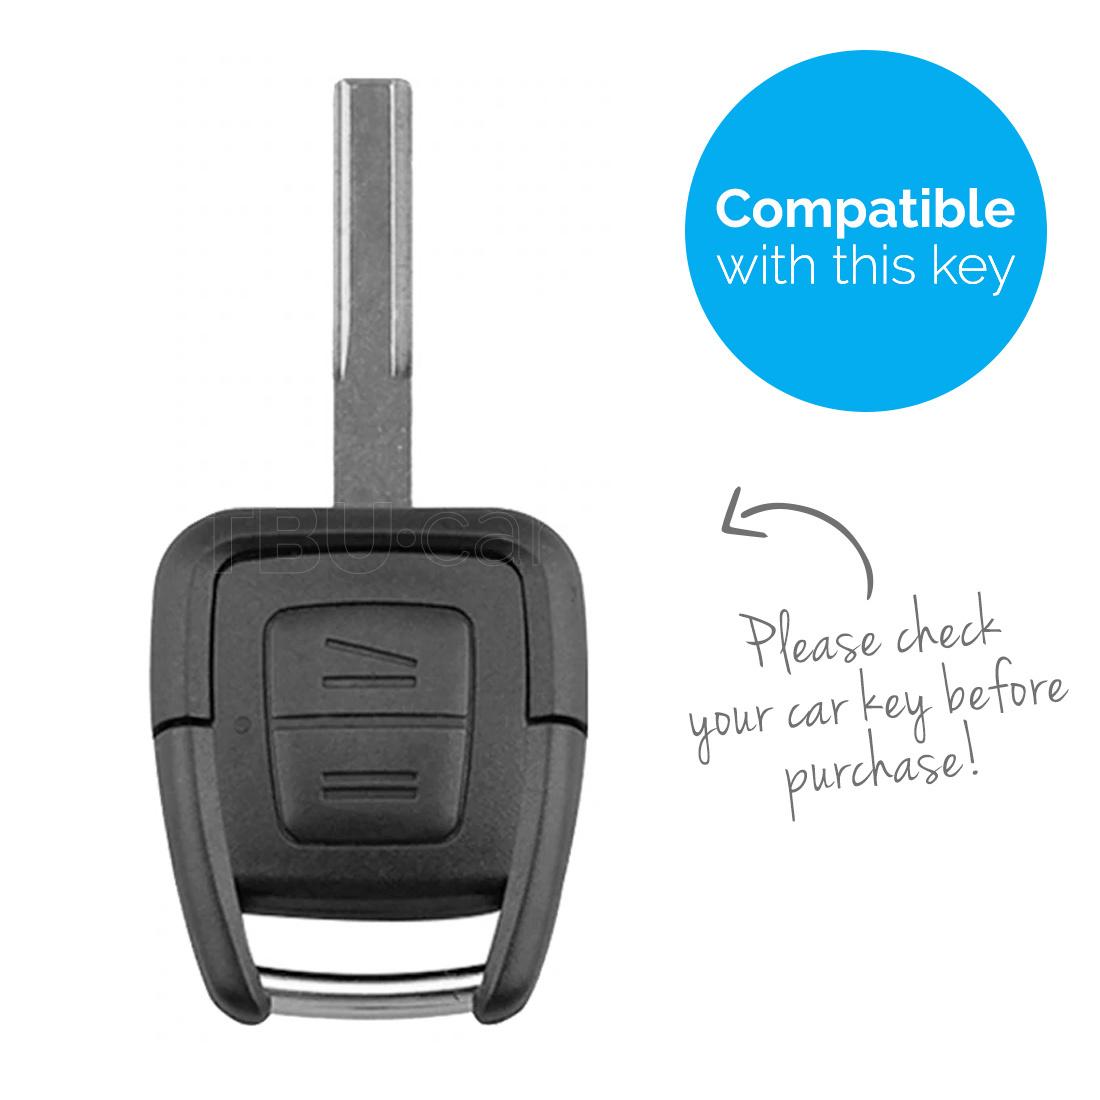 TBU car TBU car Autoschlüssel Hülle kompatibel mit Vauxhall 2 Tasten - Schutzhülle aus Silikon - Auto Schlüsselhülle Cover in Im Dunkeln leuchten